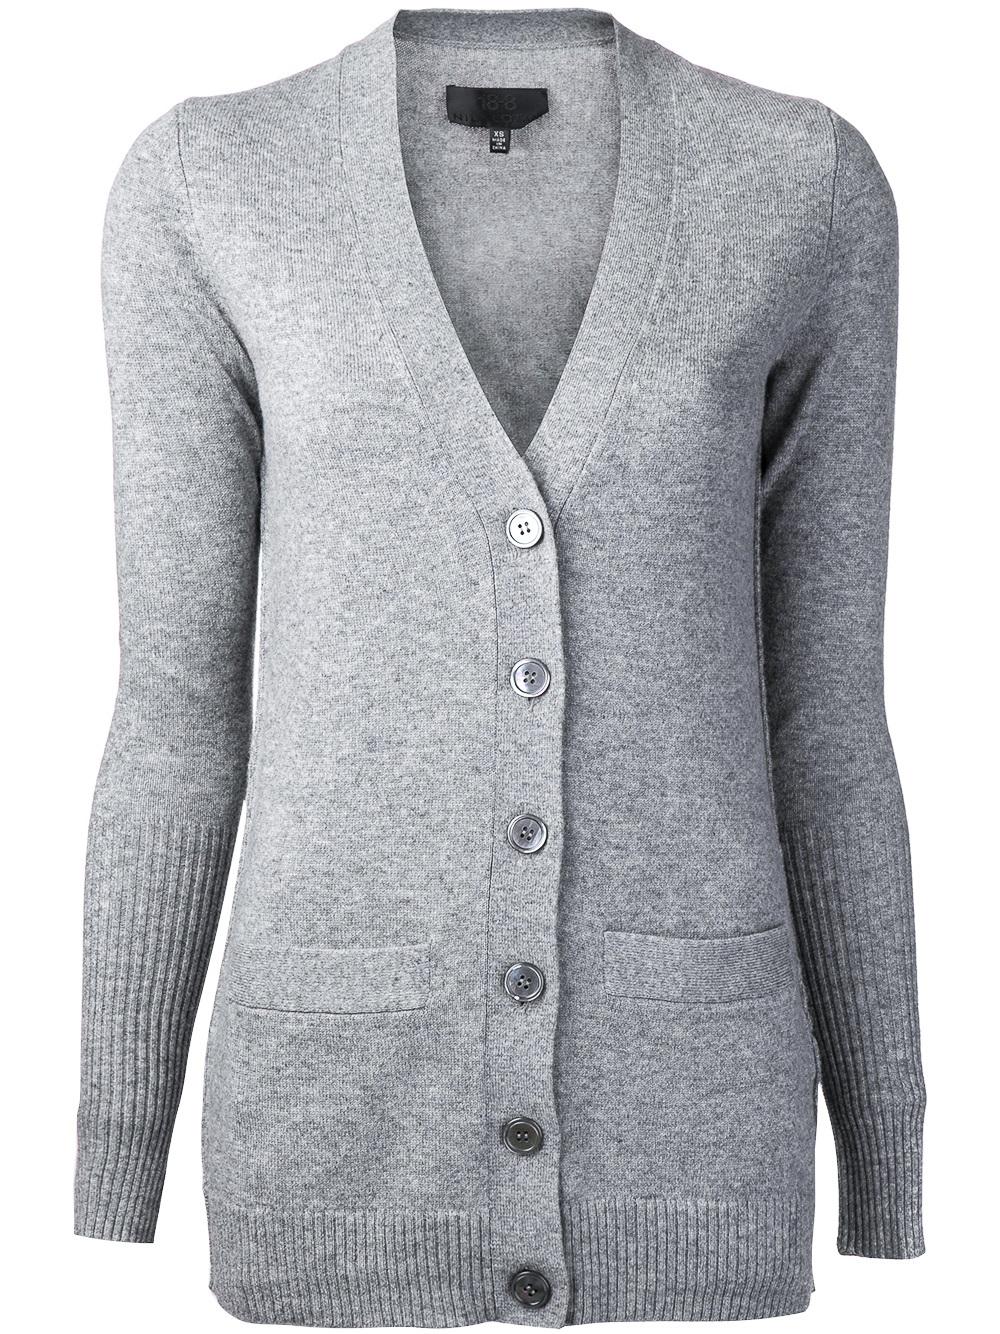 Nili lotan Cashmere Cardigan in Gray | Lyst